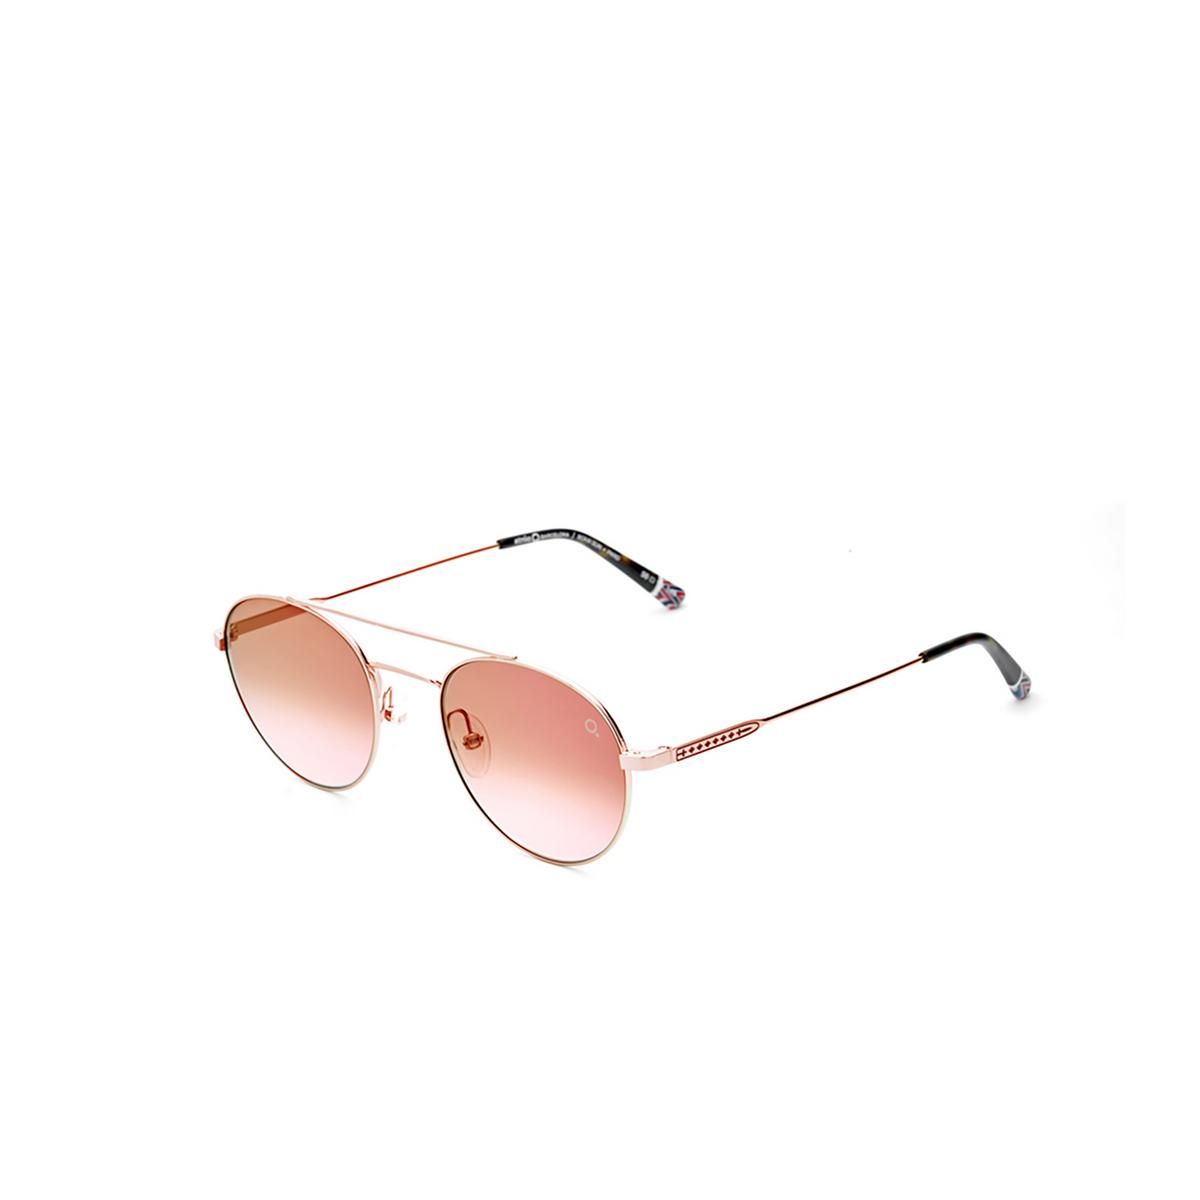 Etnia Barcelona® Round Sunglasses: Born Sun color Pkrd.